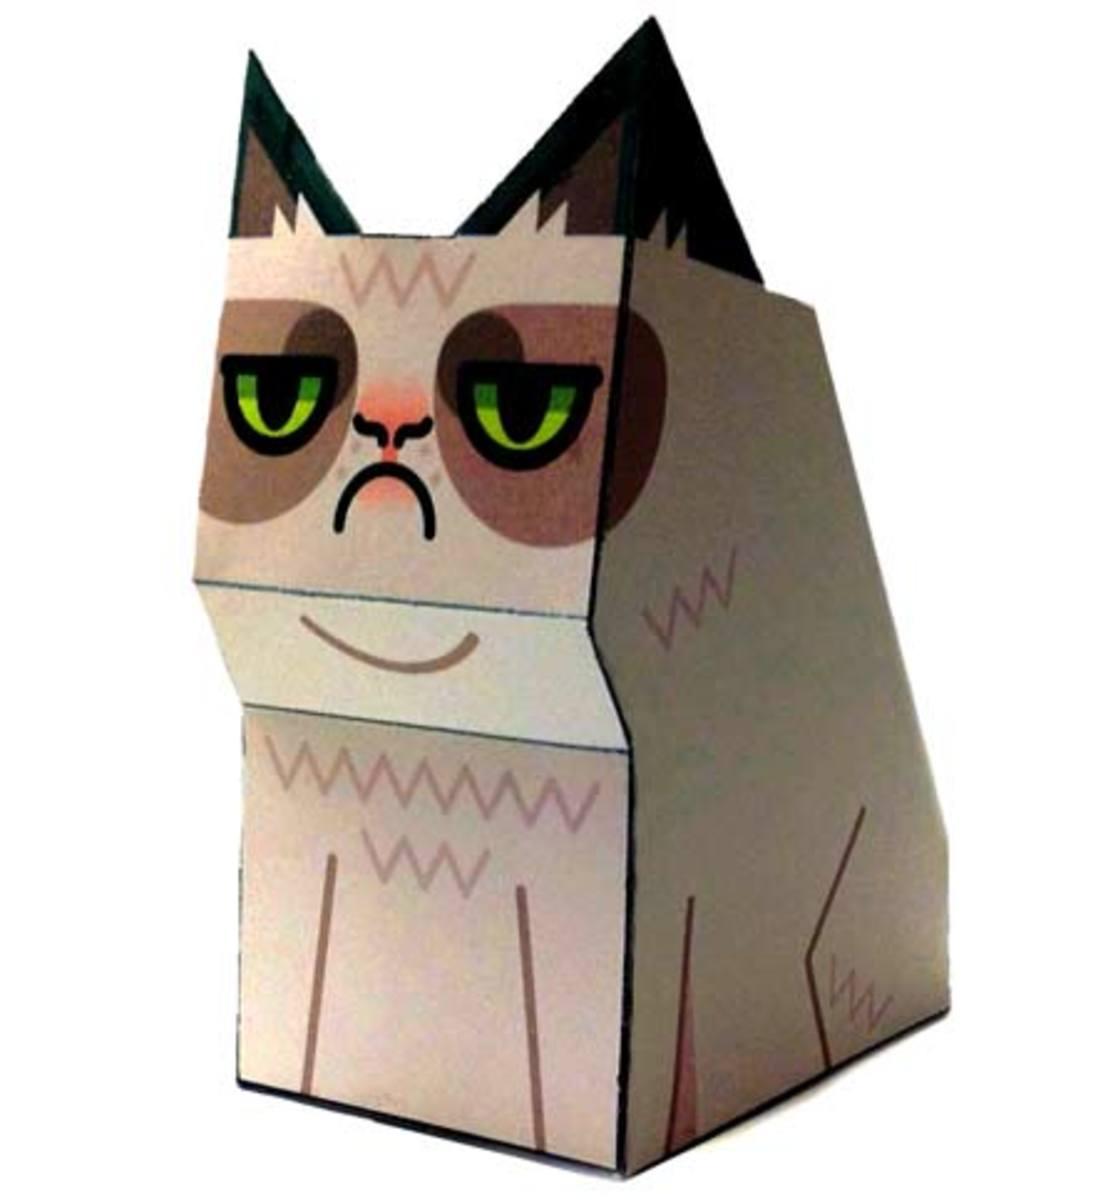 Make a 3-D Grumpy Cat From Paper